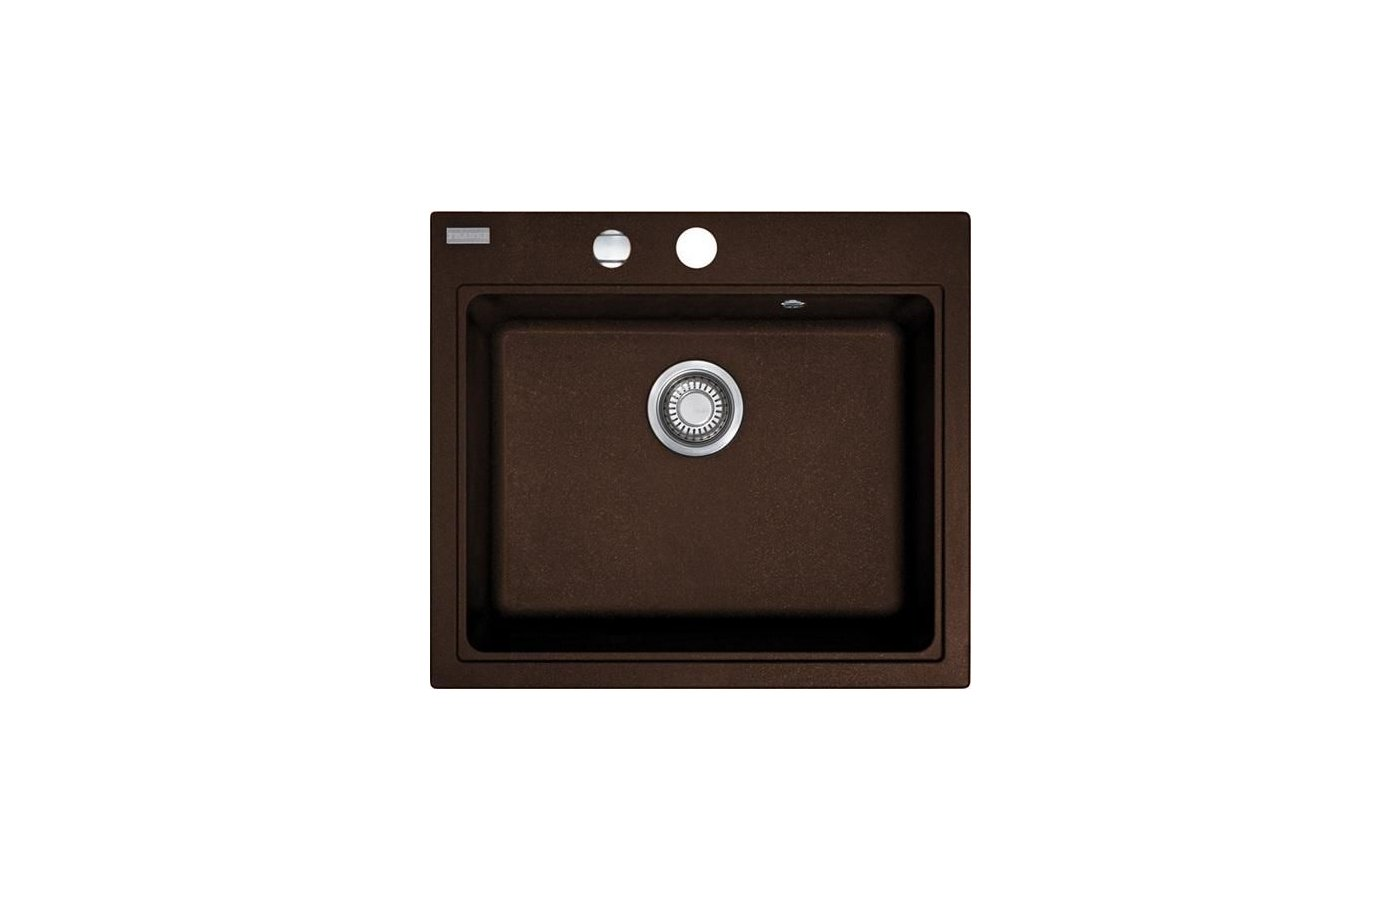 Кухонная мойка FRANKE MRG 610-58 оникс